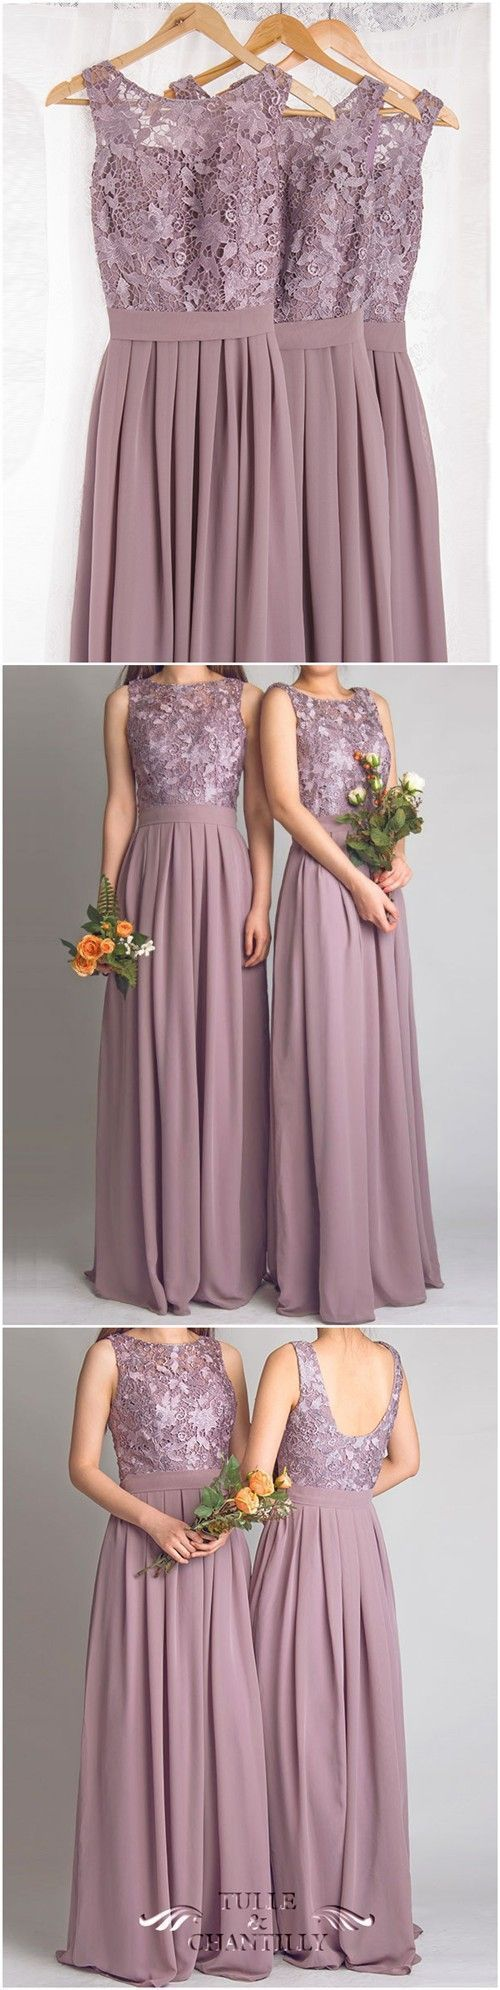 lilac bridesmaid vintage lace dress #lace #bridesmaid #bridesmaiddresses #lilac